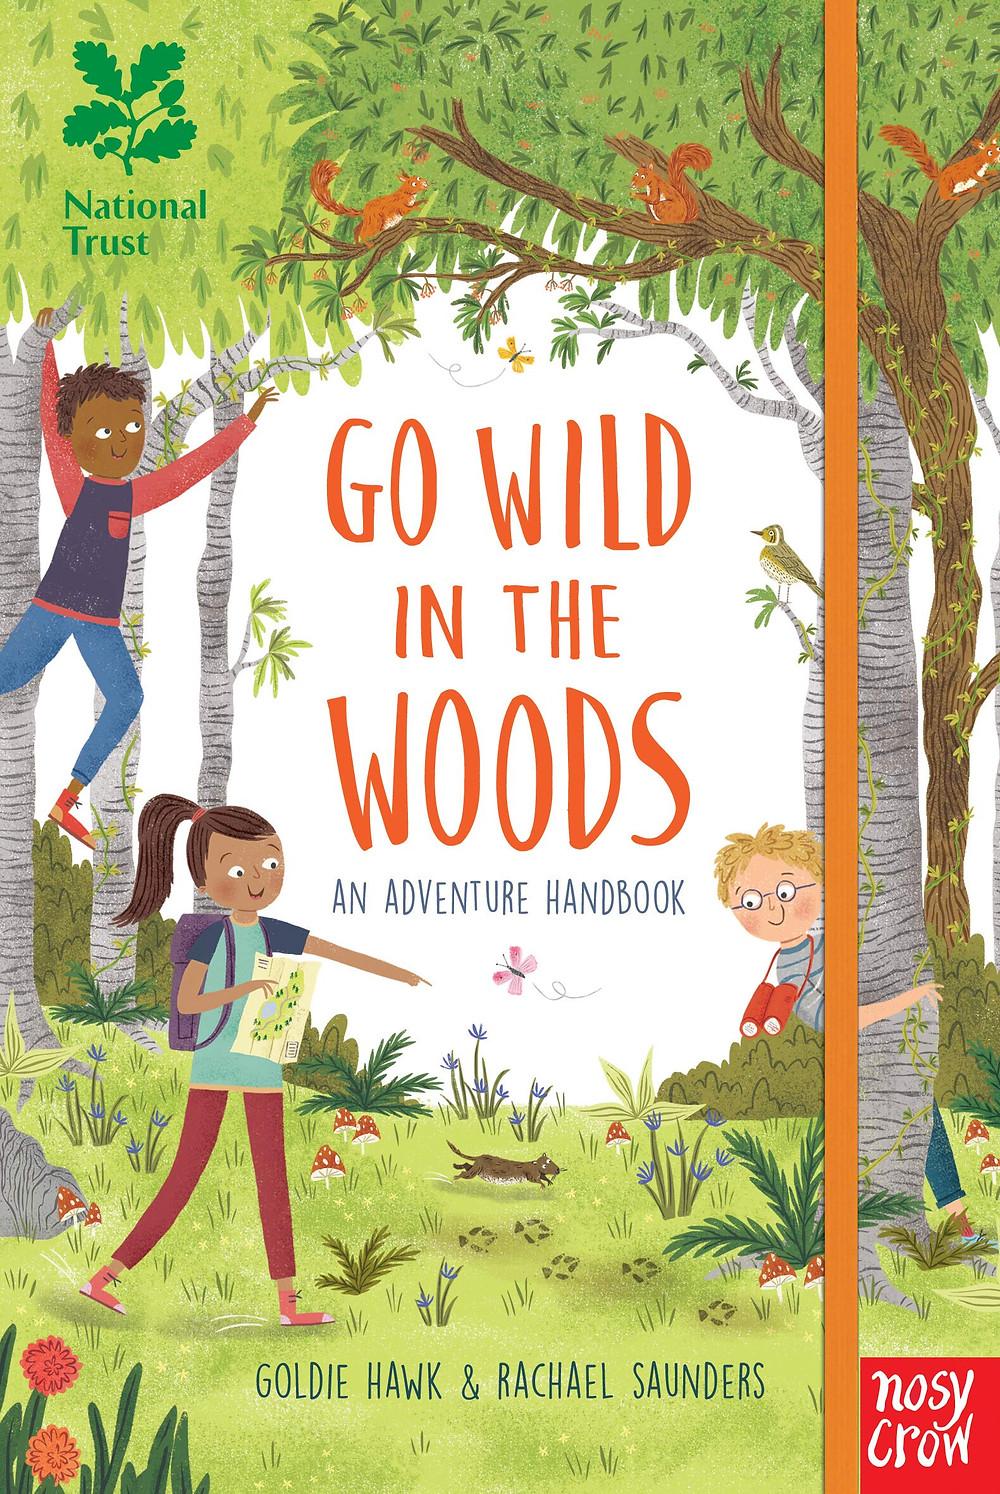 Book - go wild in the woods